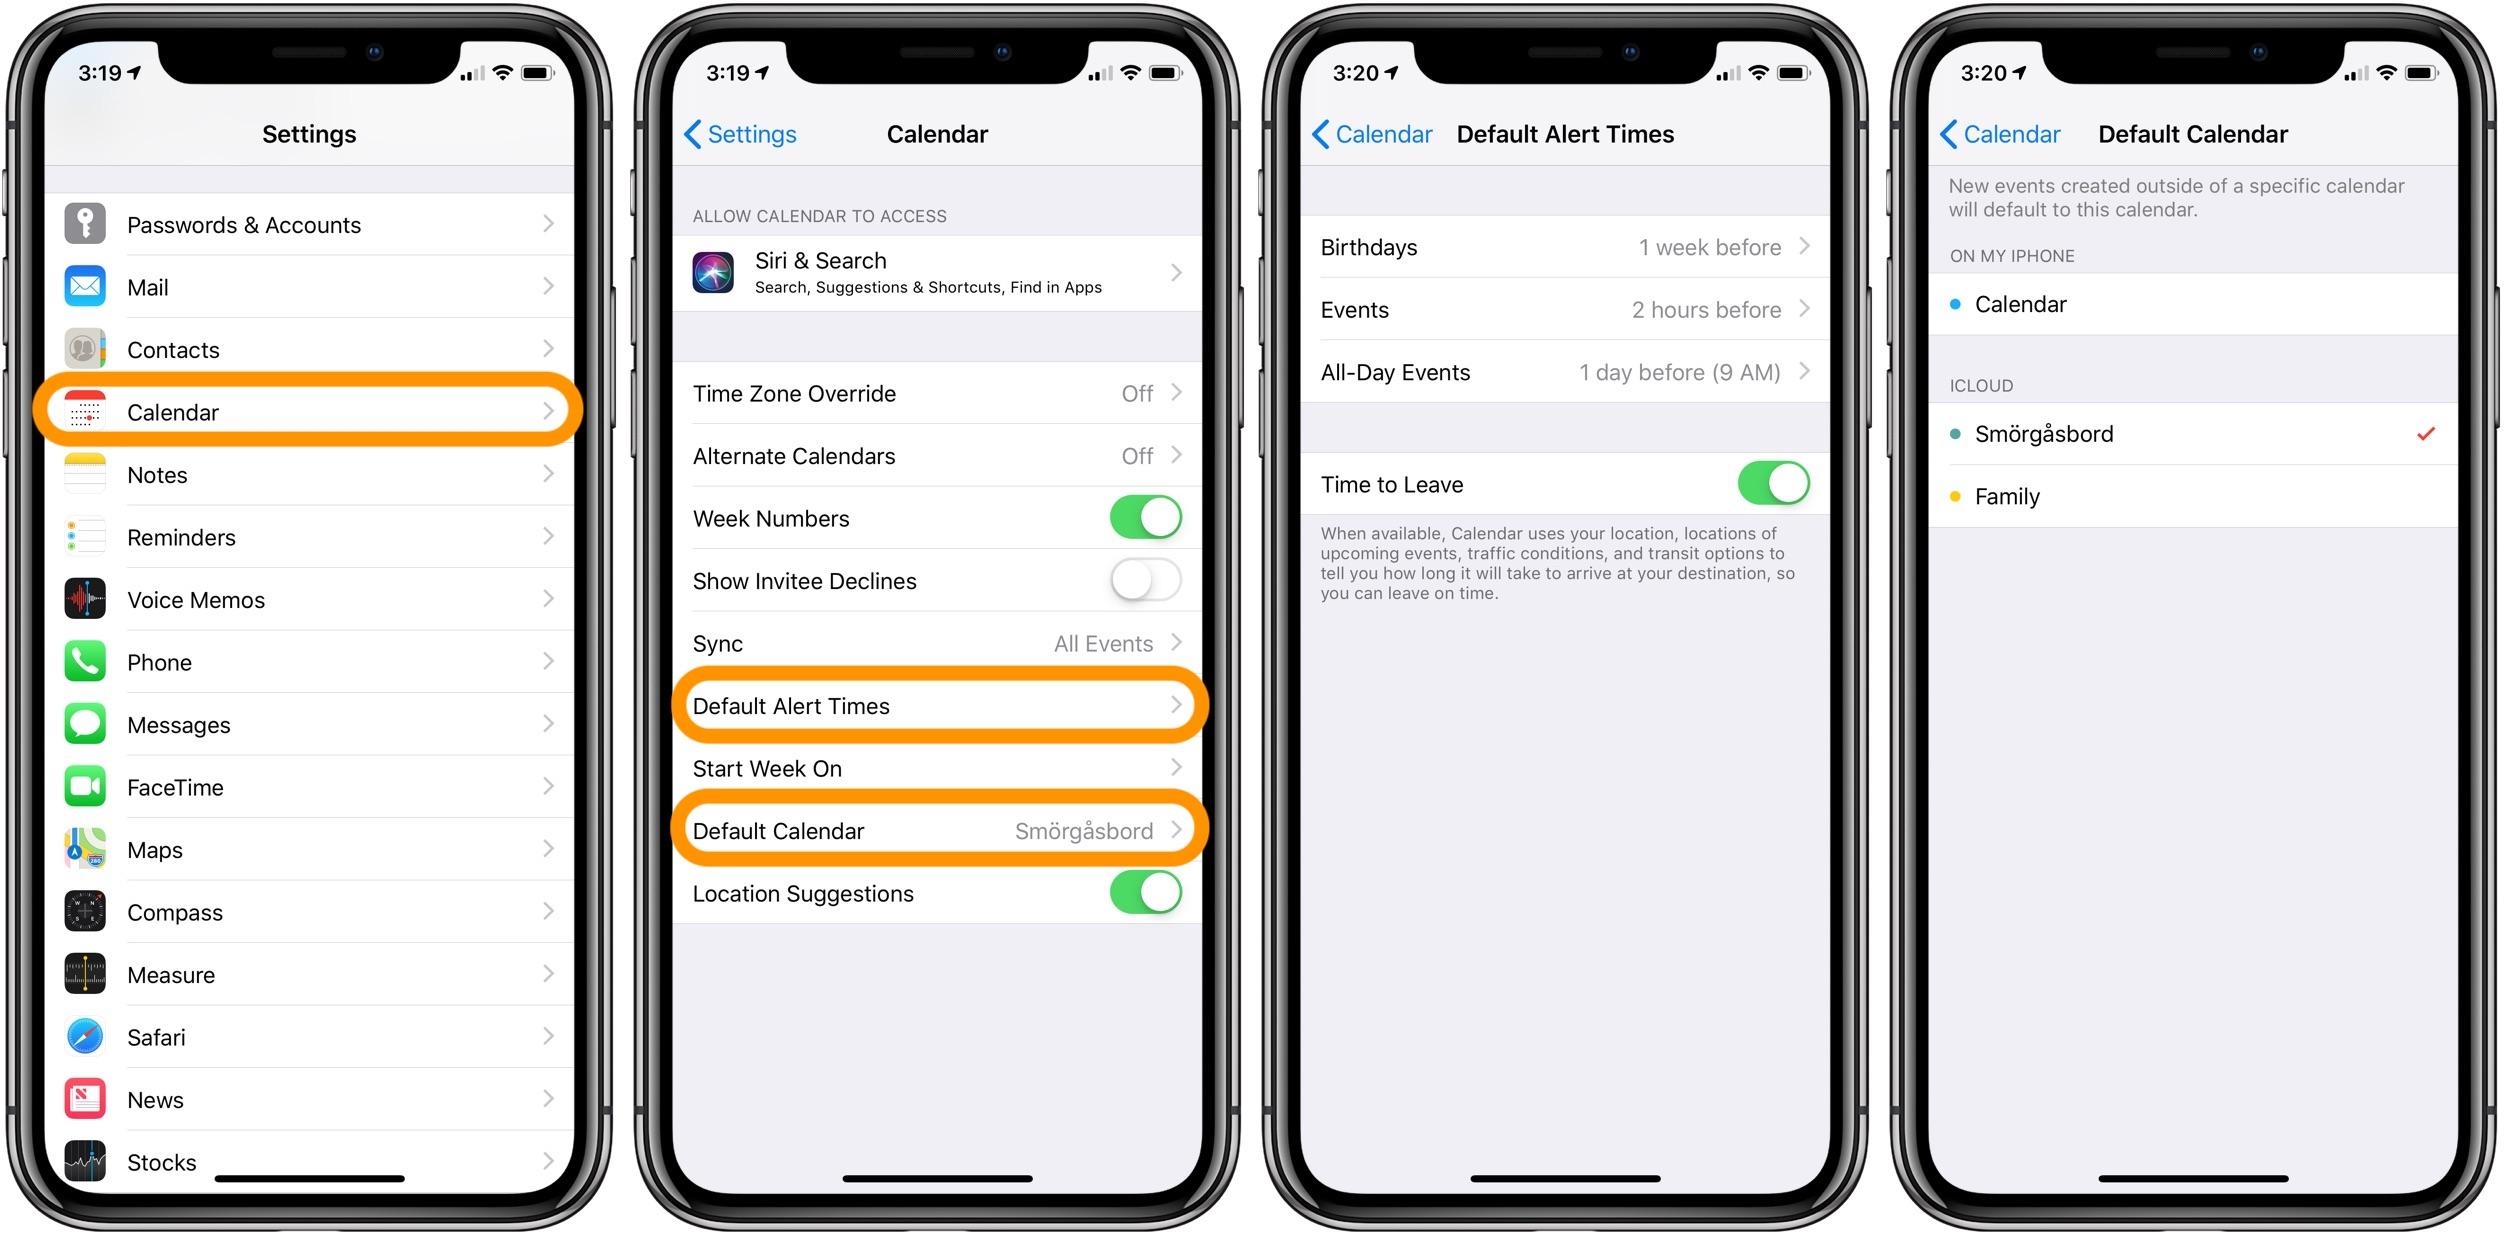 iPhone & iPad: How to customize calendar settings - 9to5Mac